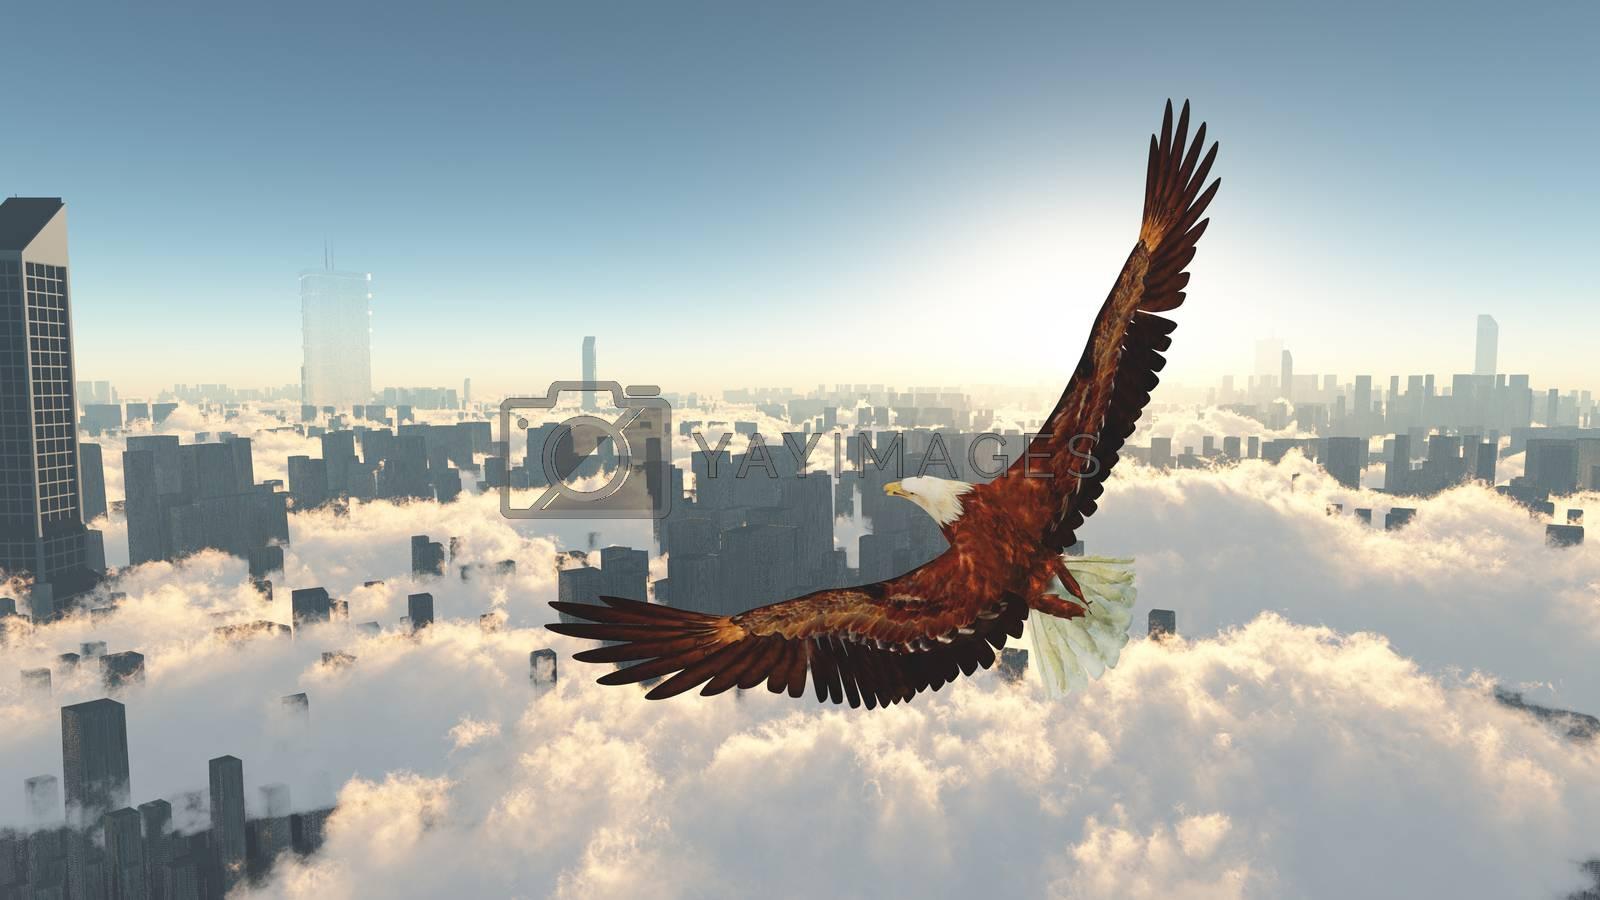 Eagle flies above megapolis. 3D rendering